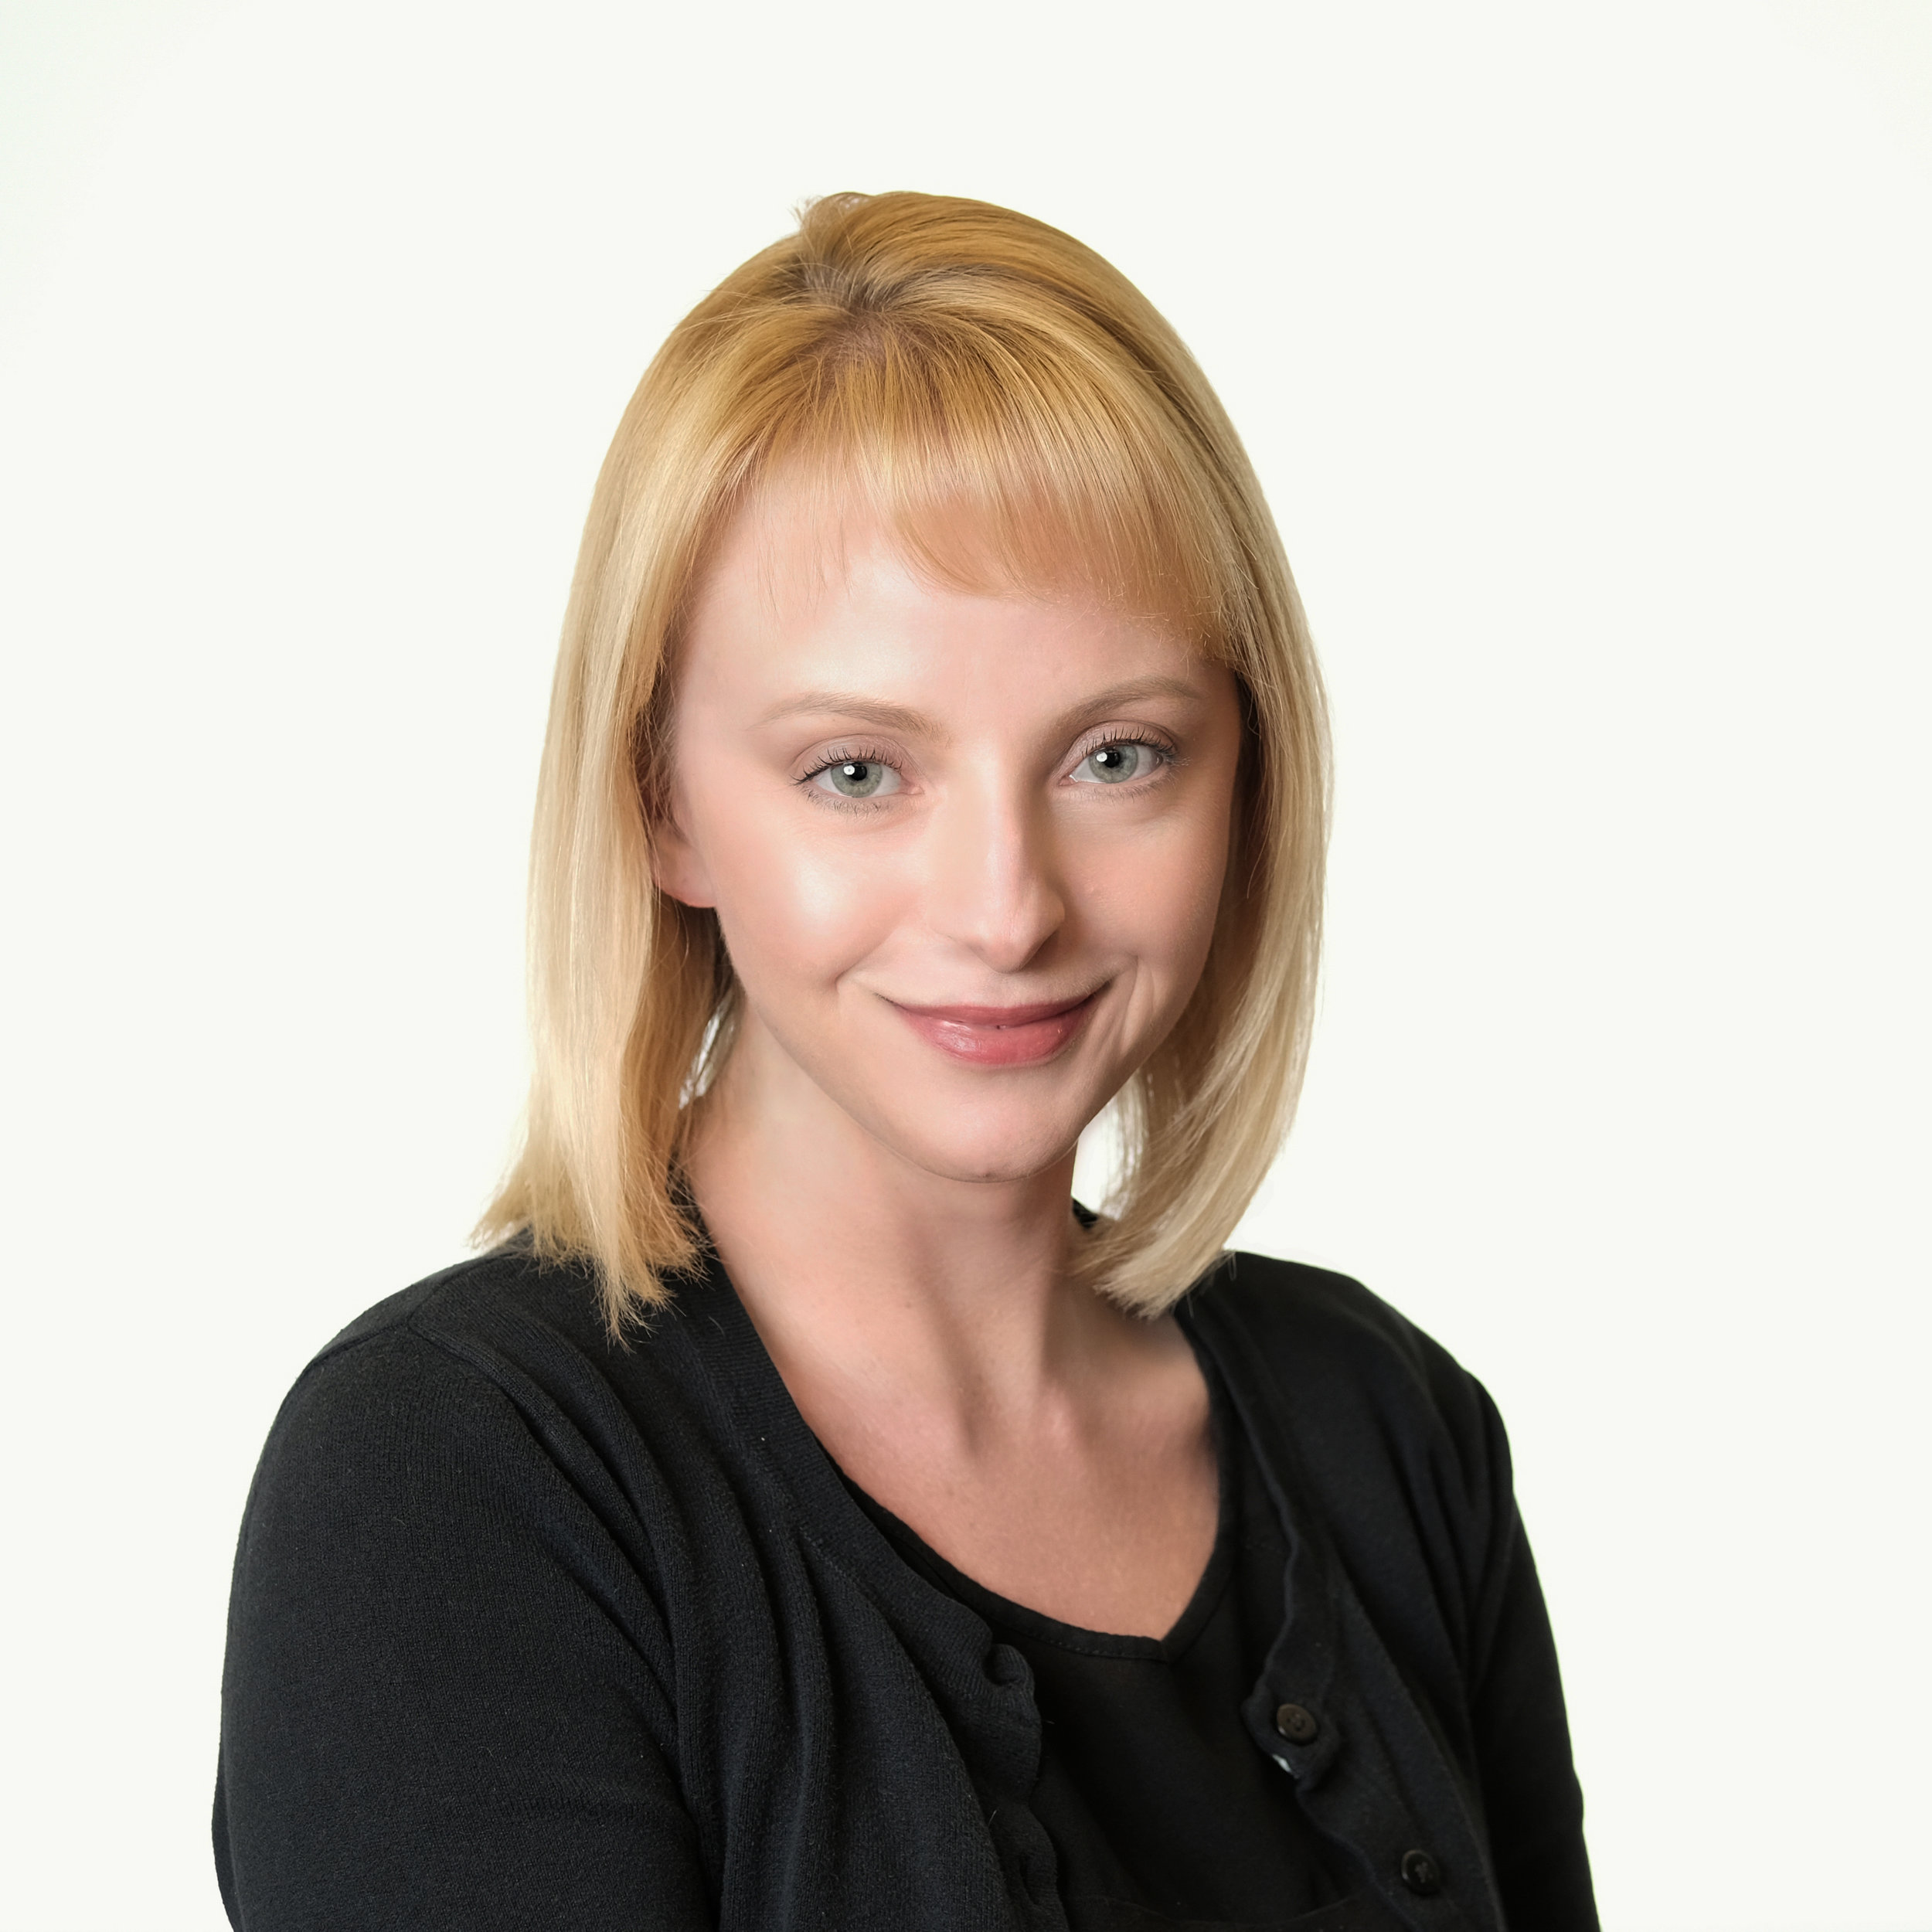 Heather Anders - Architectural Design Techhanders@burwil.com